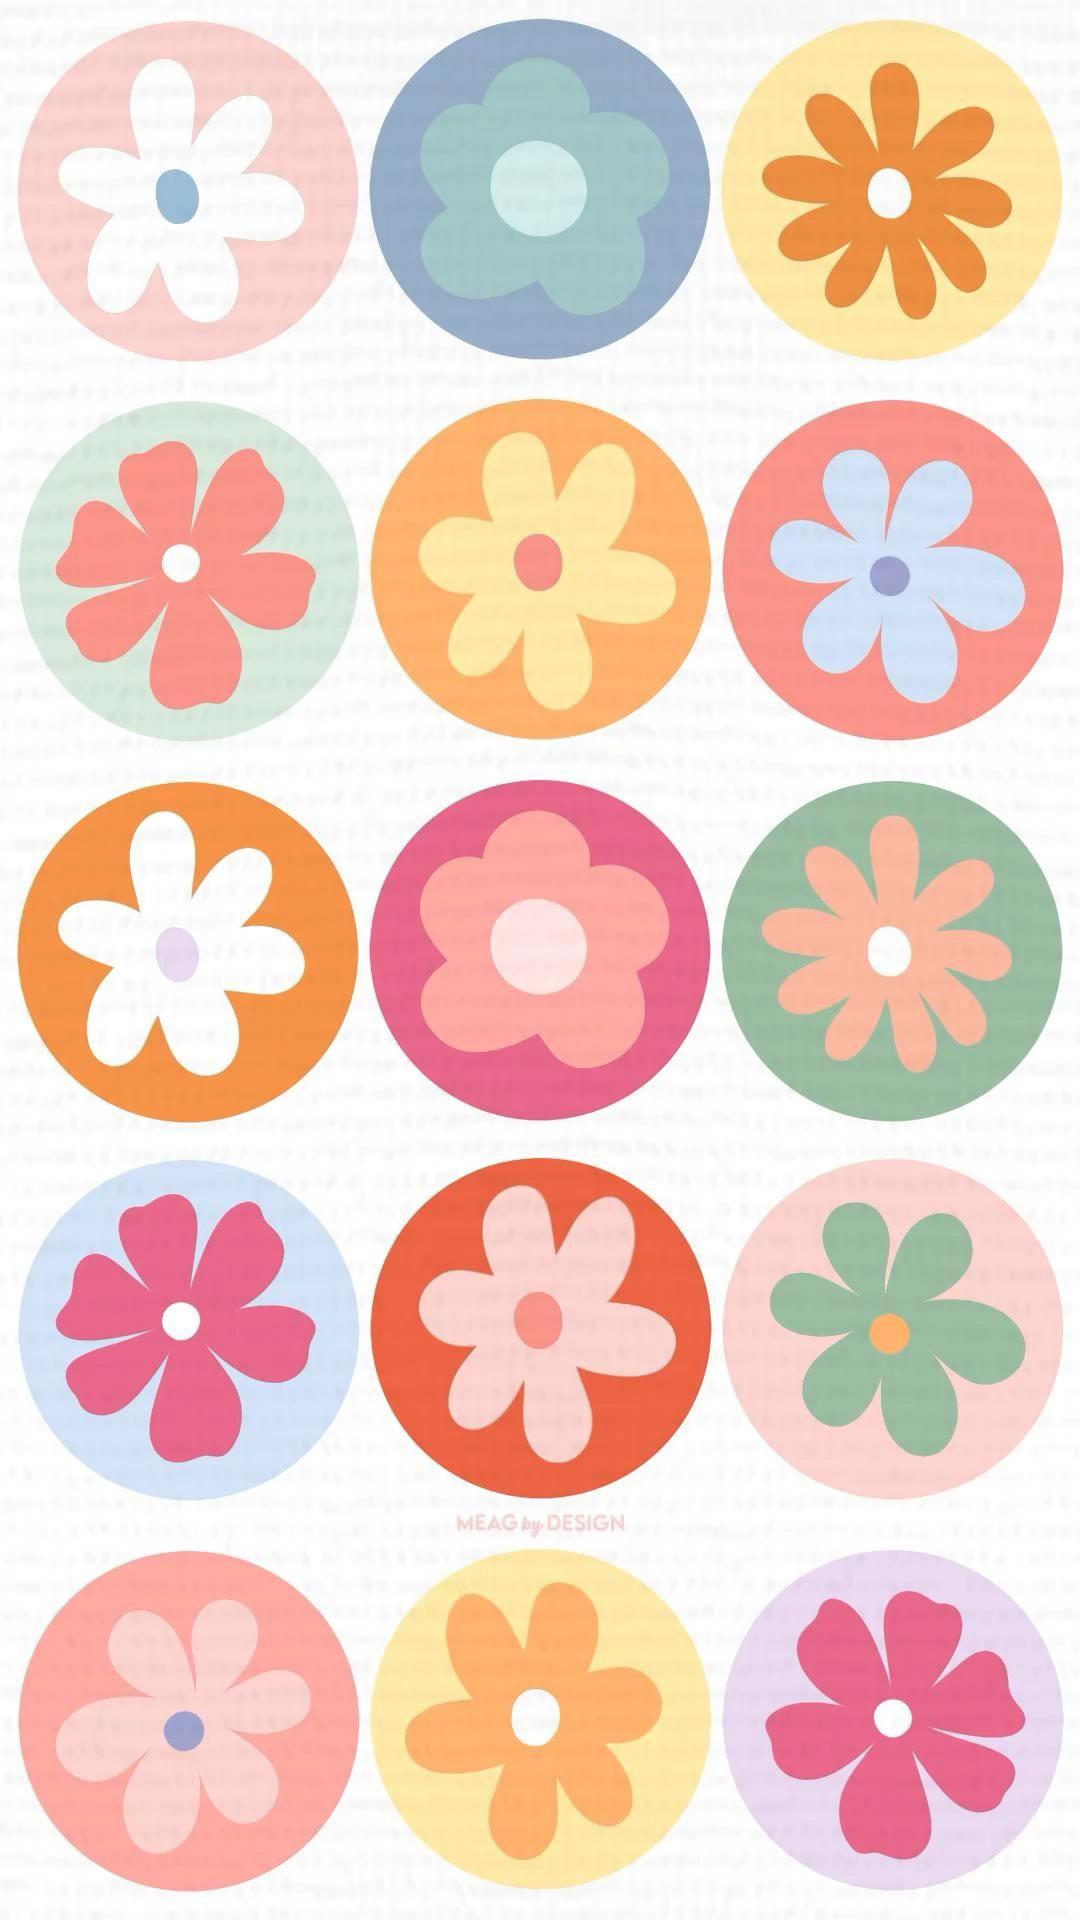 RETRO FLOWER BACKGROUNDS 🌸✨